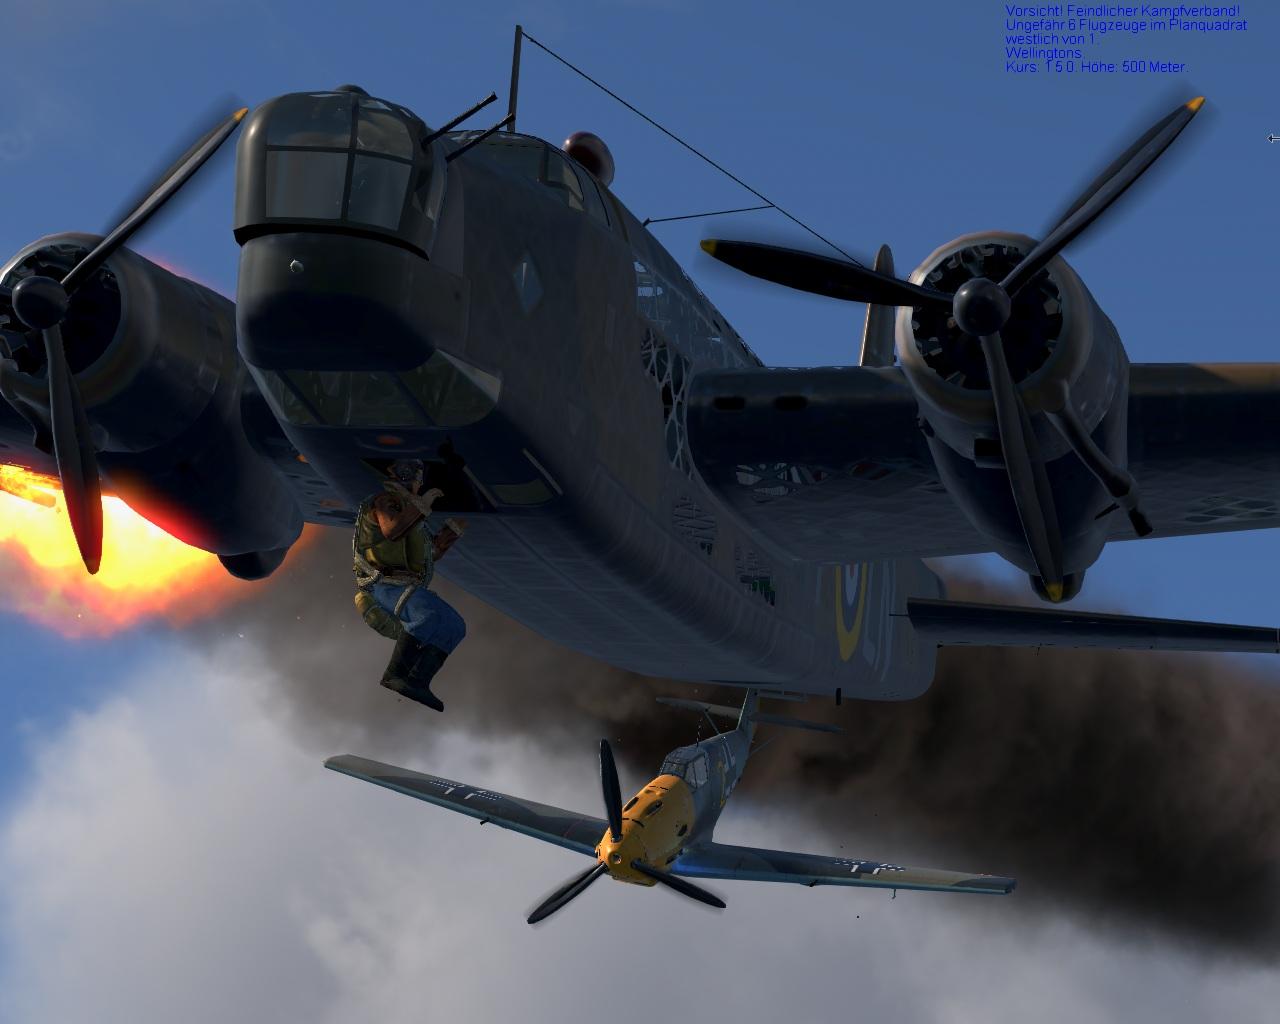 Launcher2014-04-1615-35-55-25.jpg